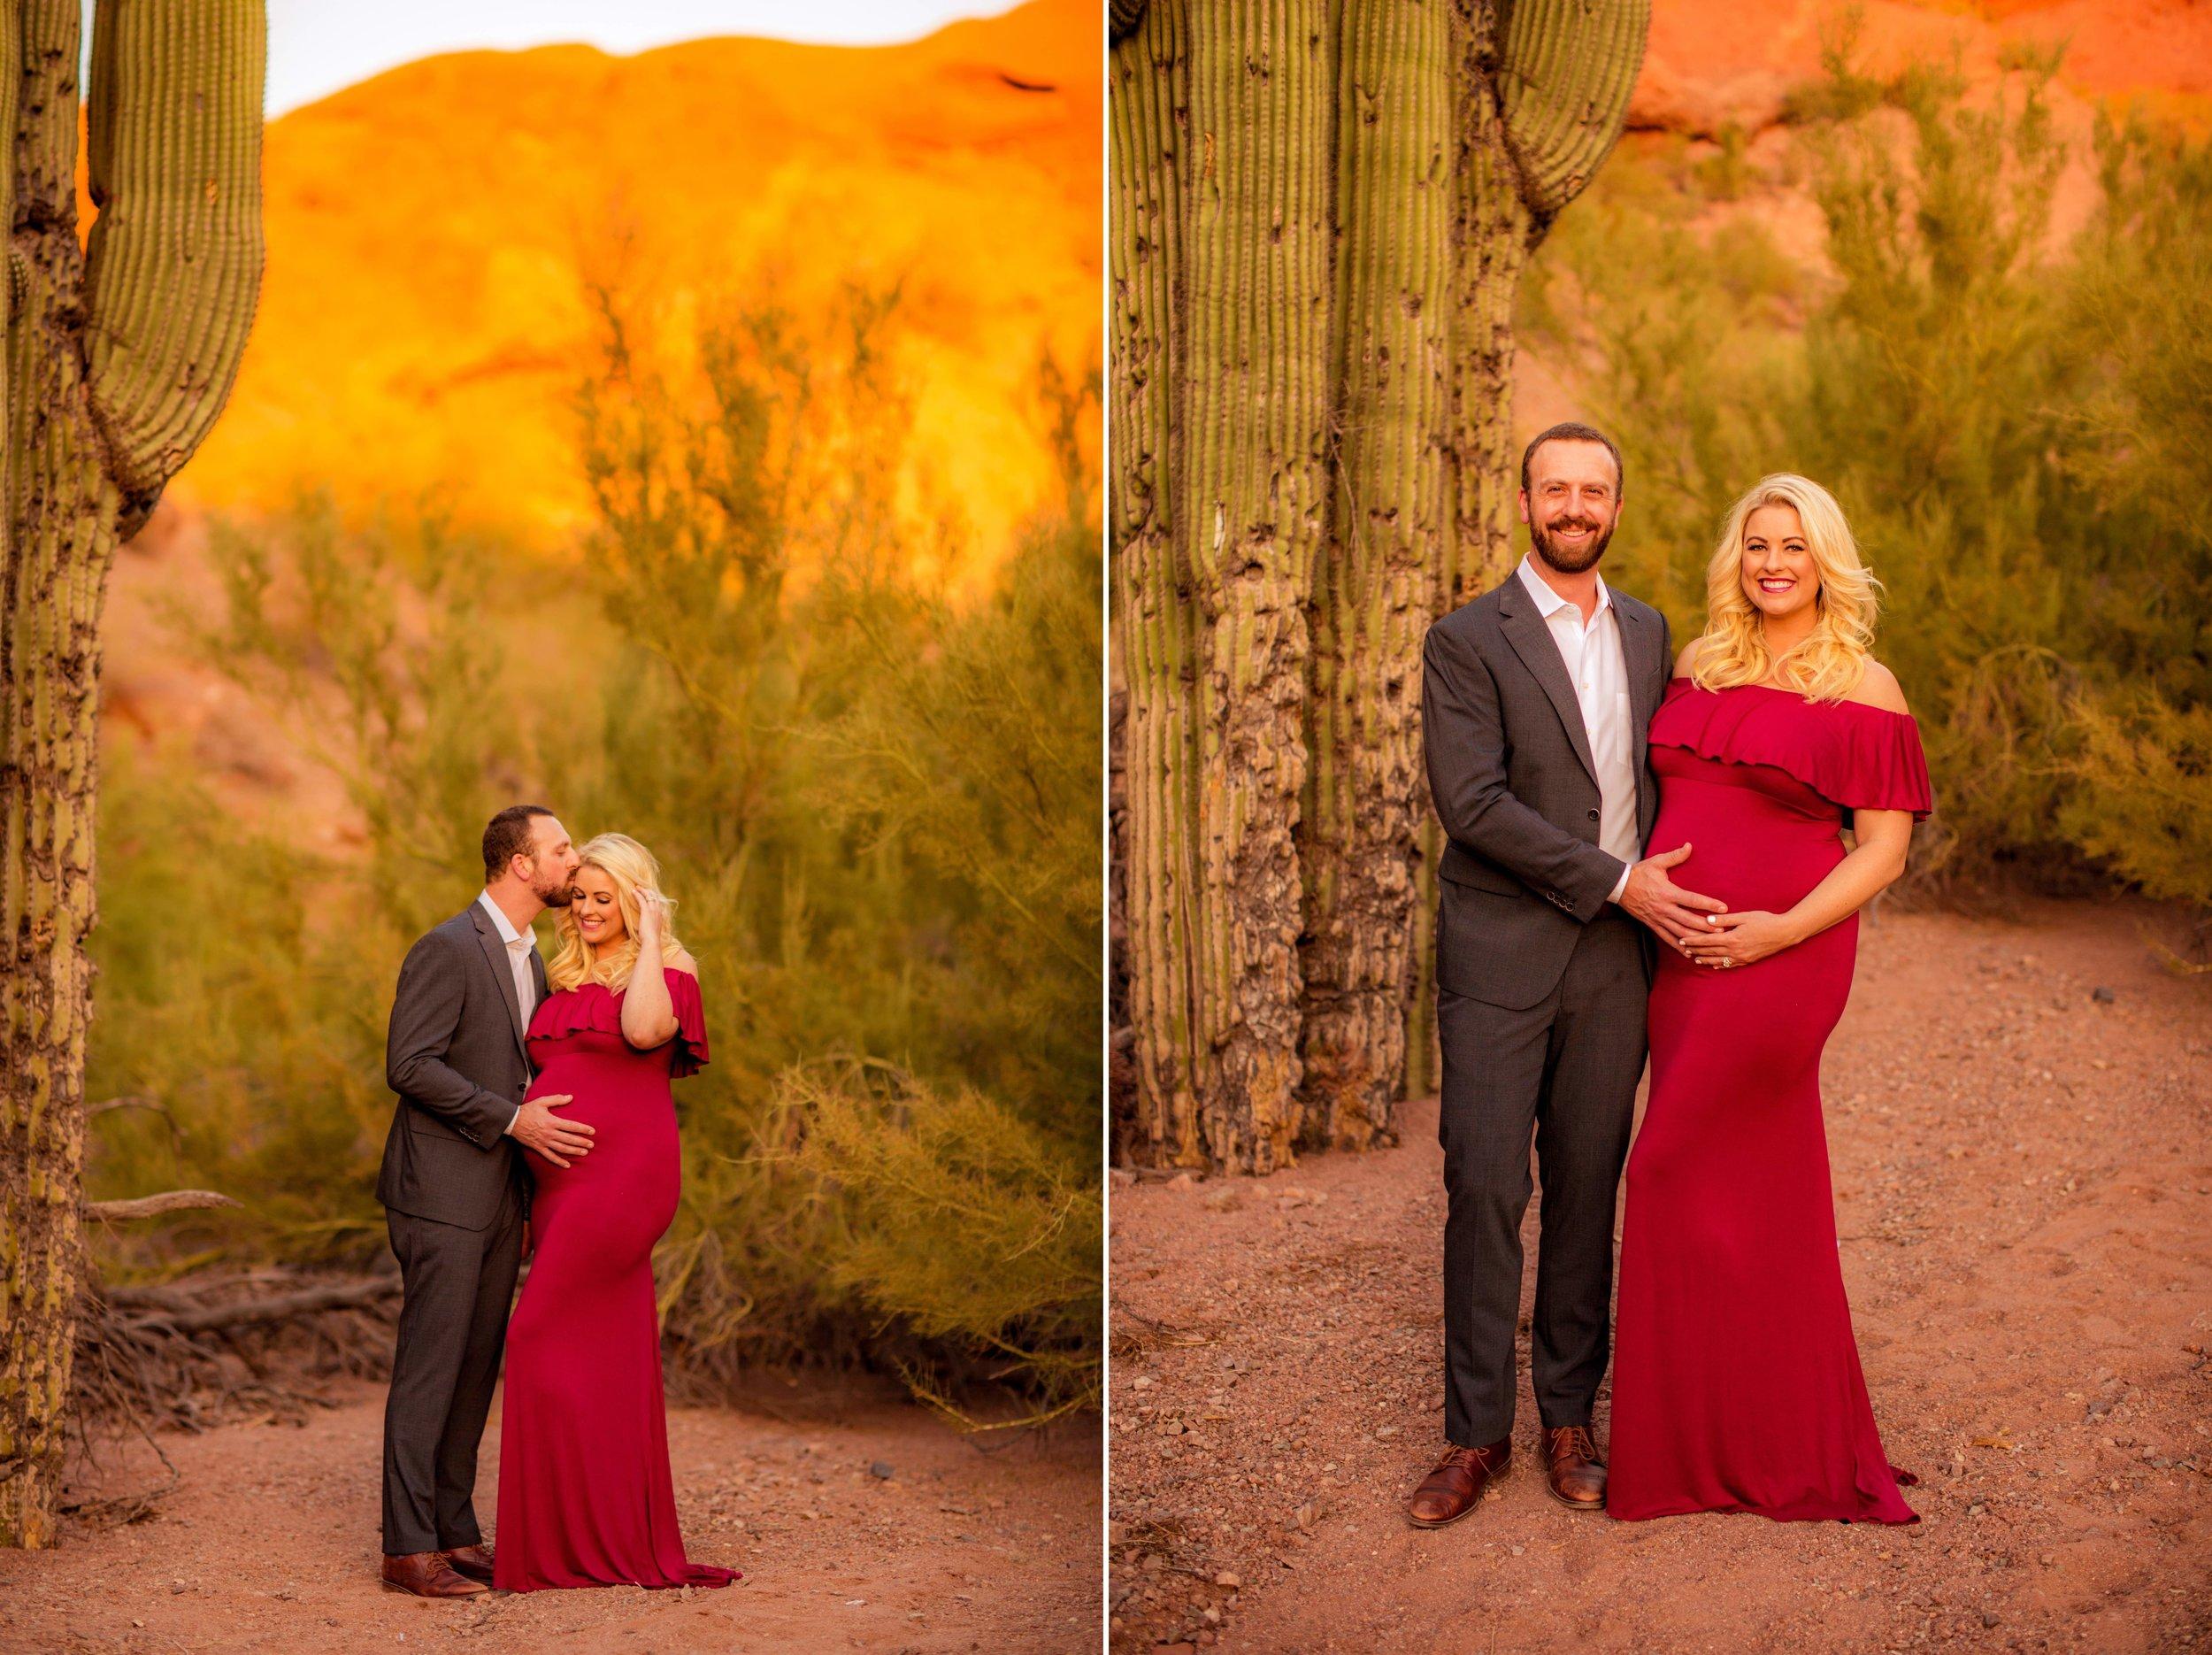 -colorado-wedding-photographer-denver-springs-vail-607A0270.jpeg